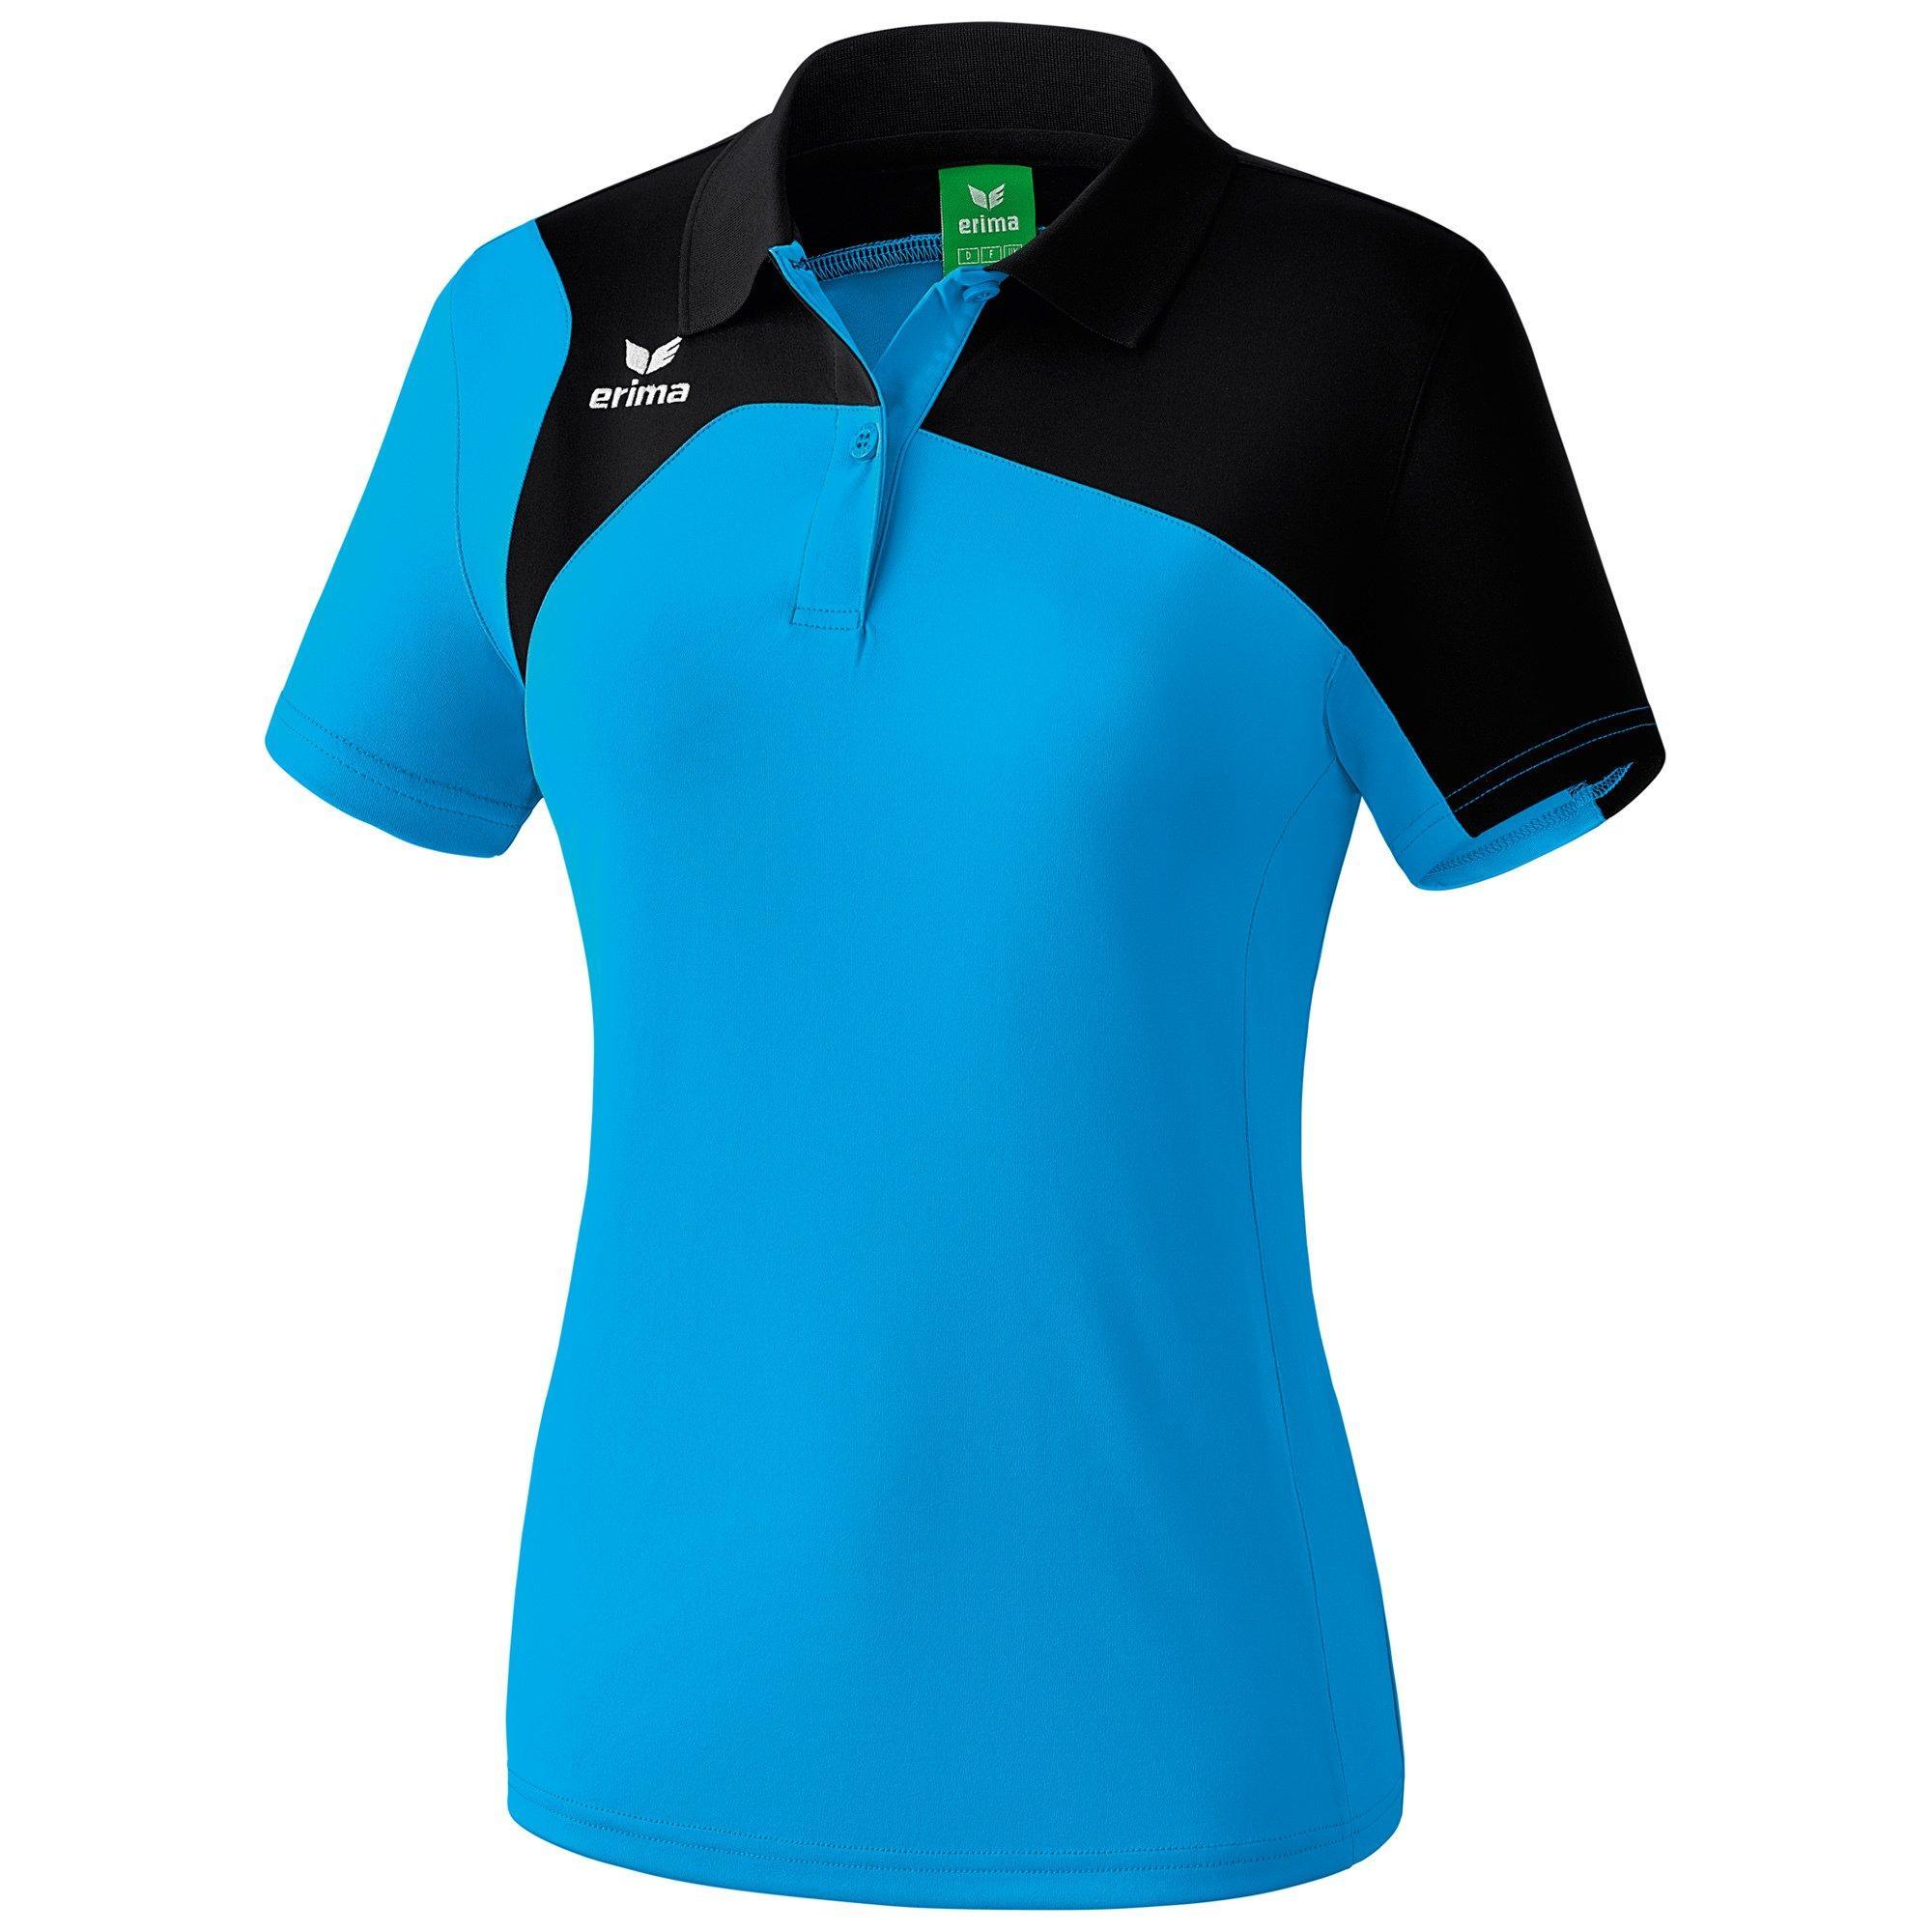 Erima Club 1900 20 Poloshirt Damen